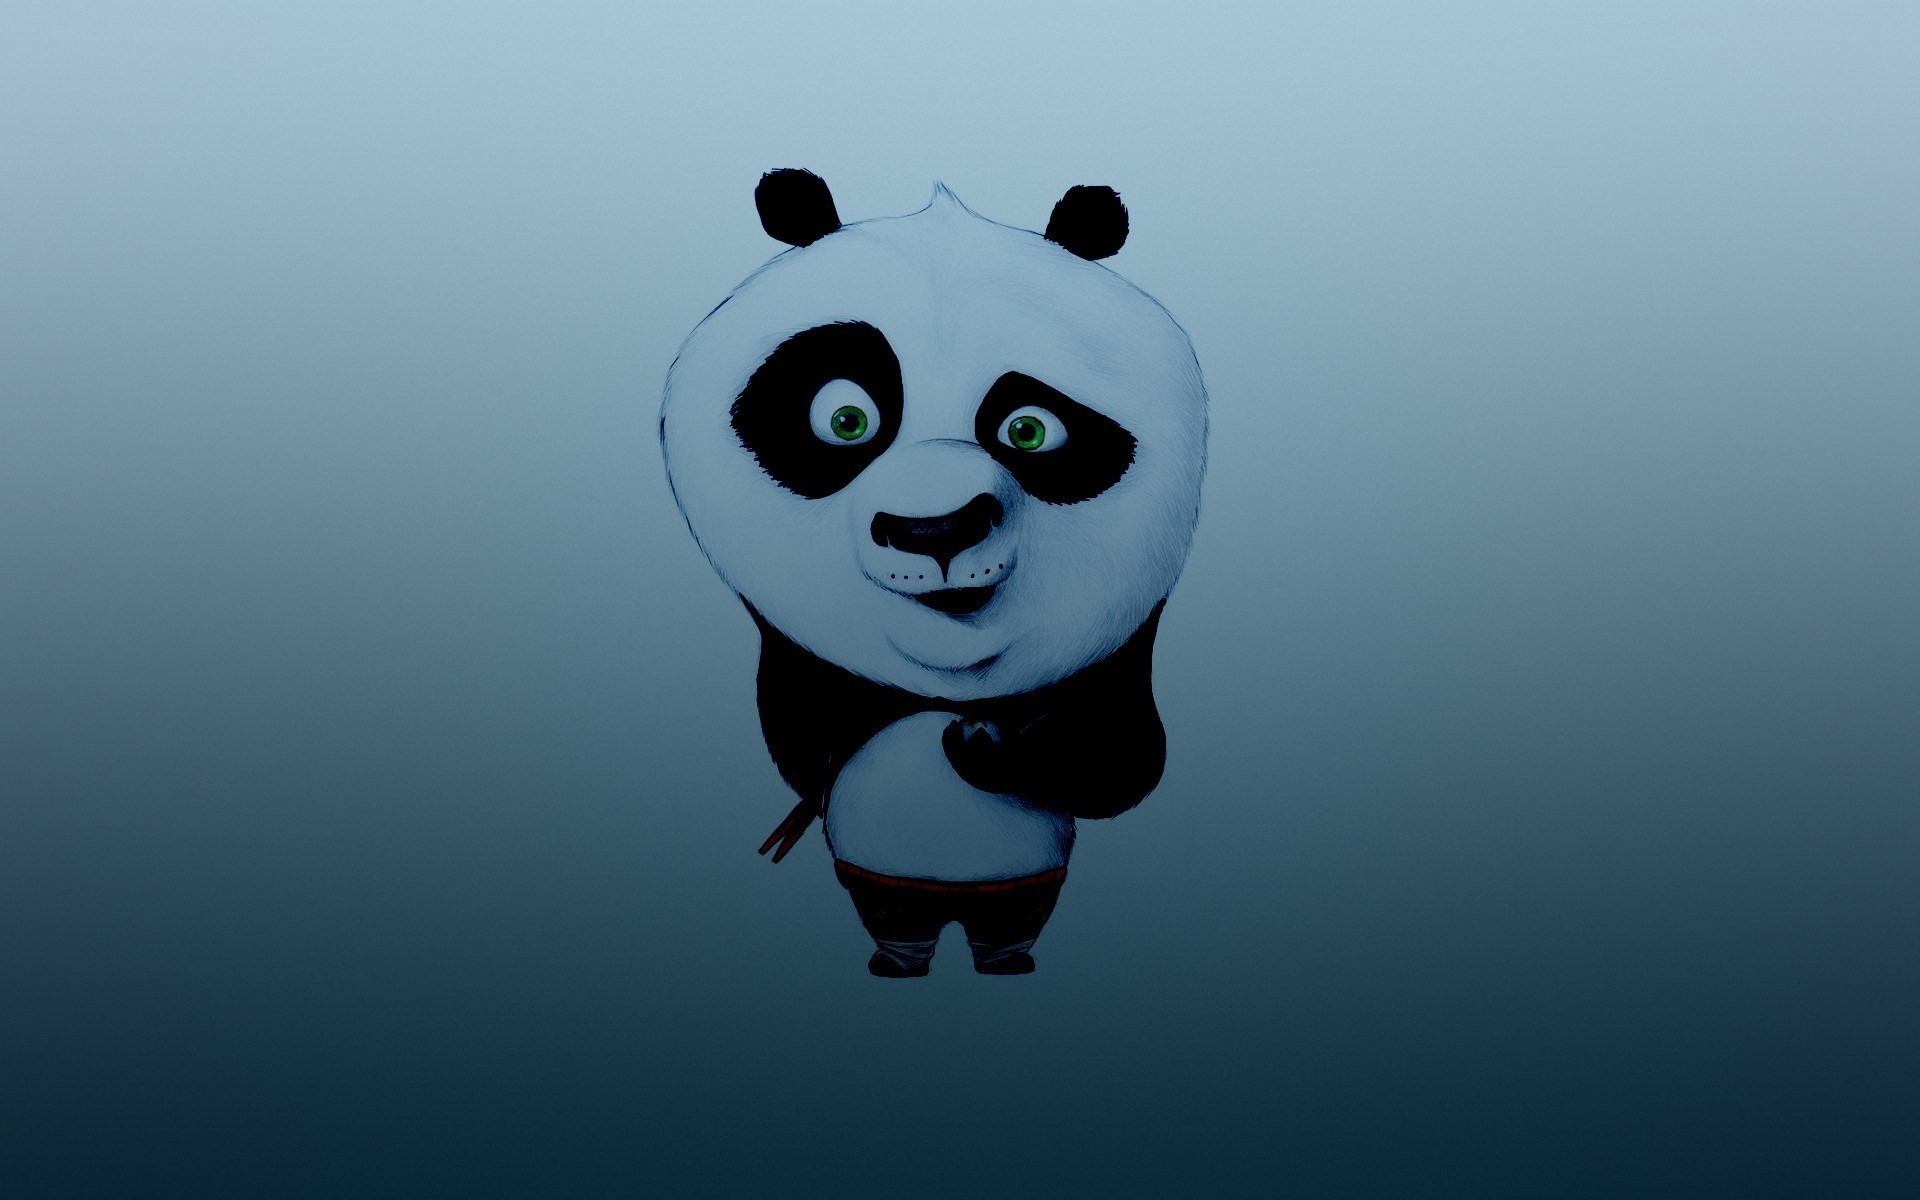 … Kung Fu Panda Art Funny HD Wallpaper   FreeWallsUp